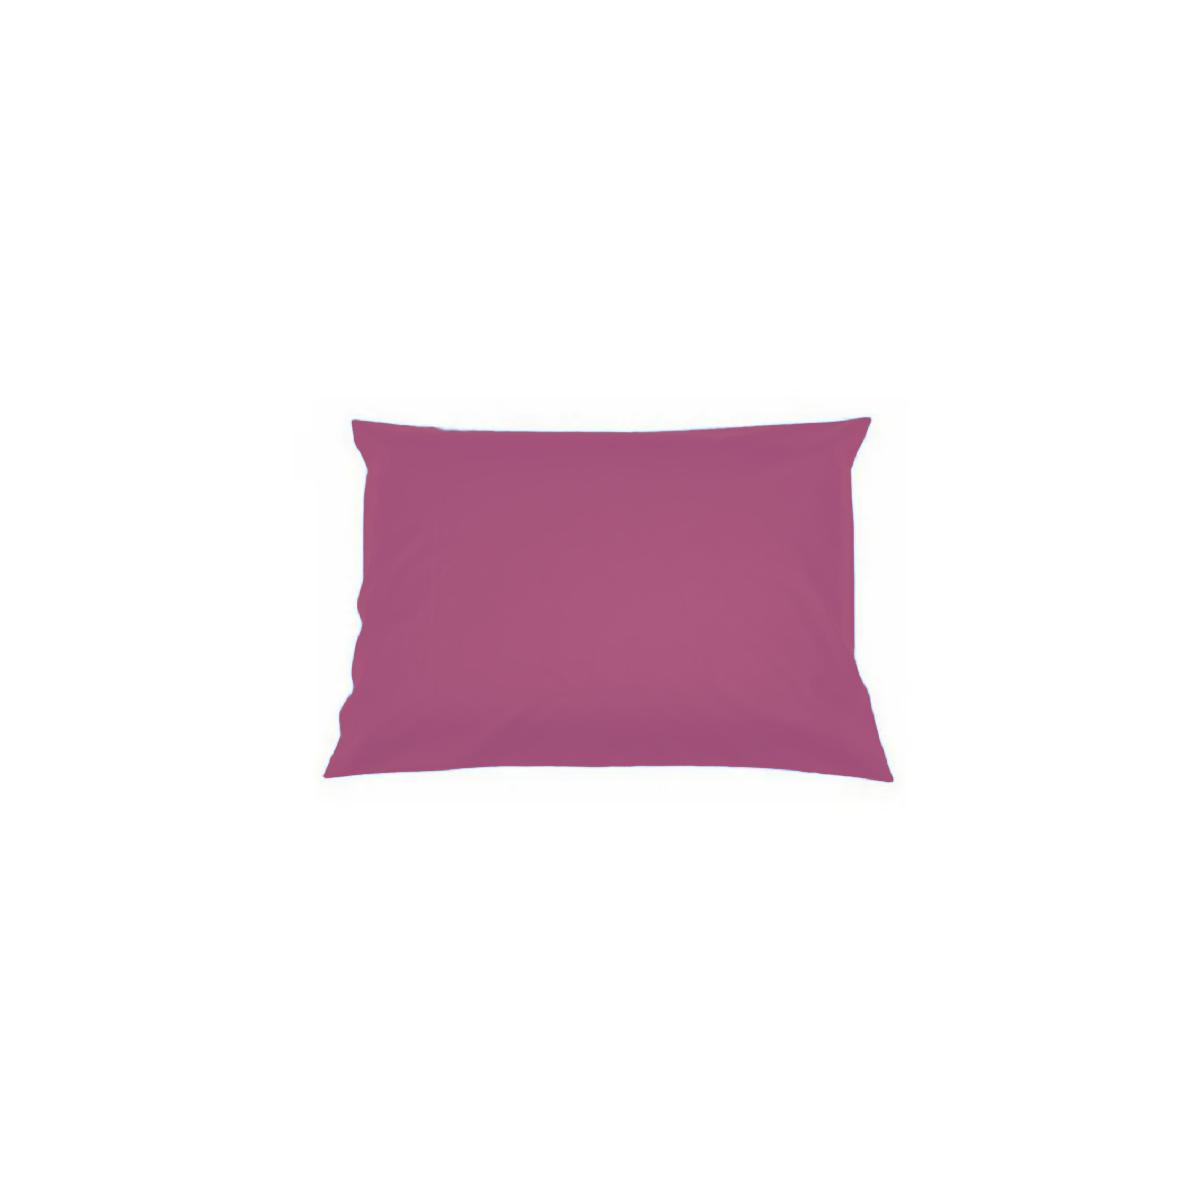 Capa Impermeavel Para Travesseiro Hospitalar - Medida Especial - Colorida  - CarroCasa